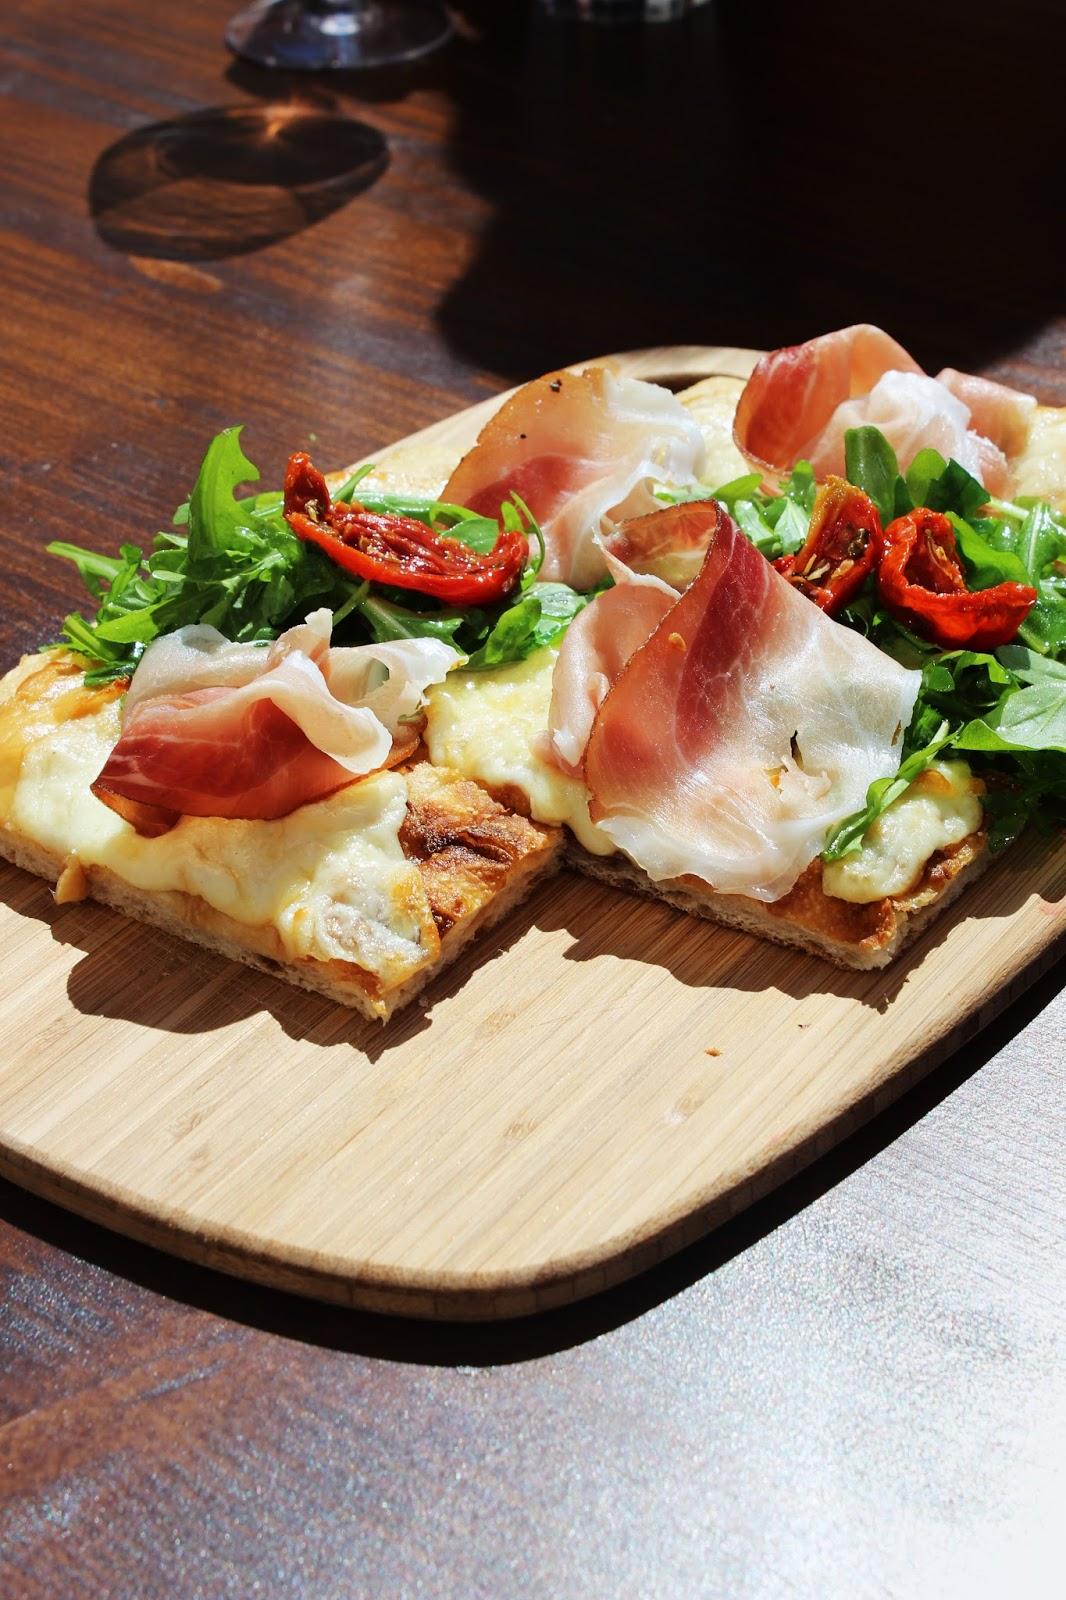 Bacchus 13 100 aix en provence paperblog - Cuisine aix en provence ...